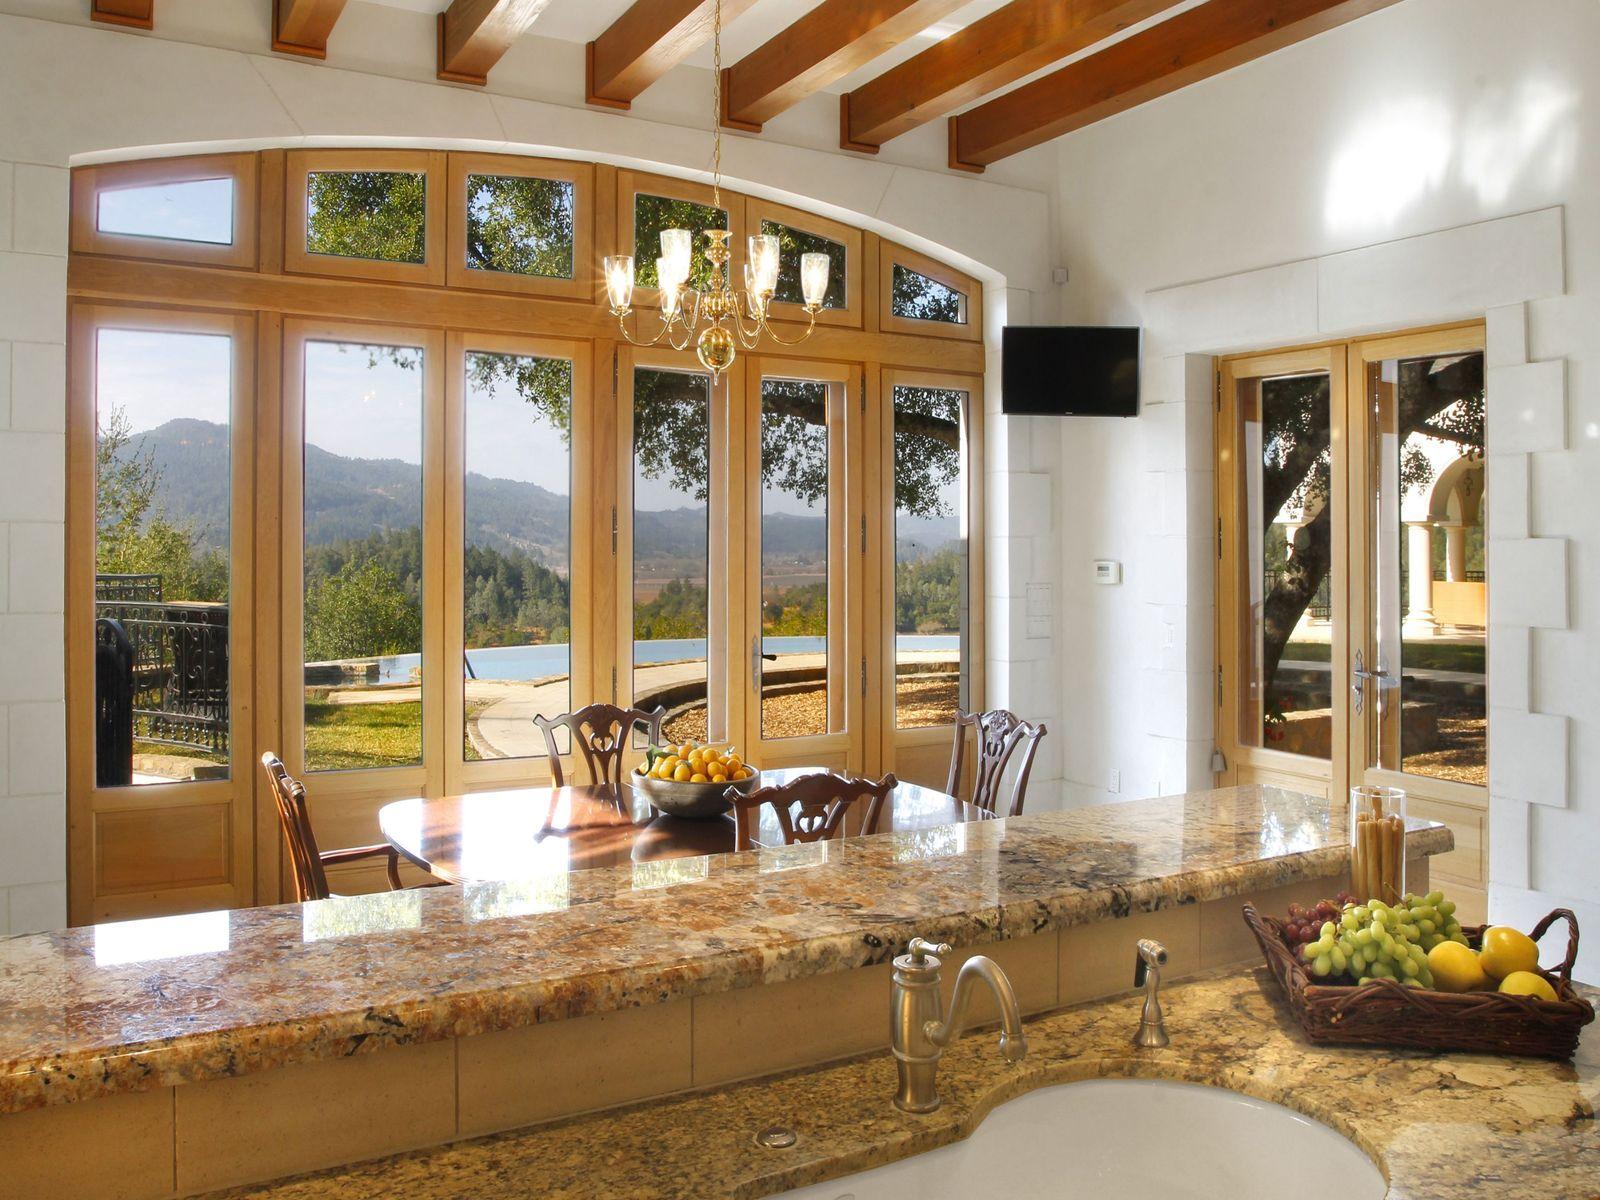 Panoramic Napa Valley Views through French doors.